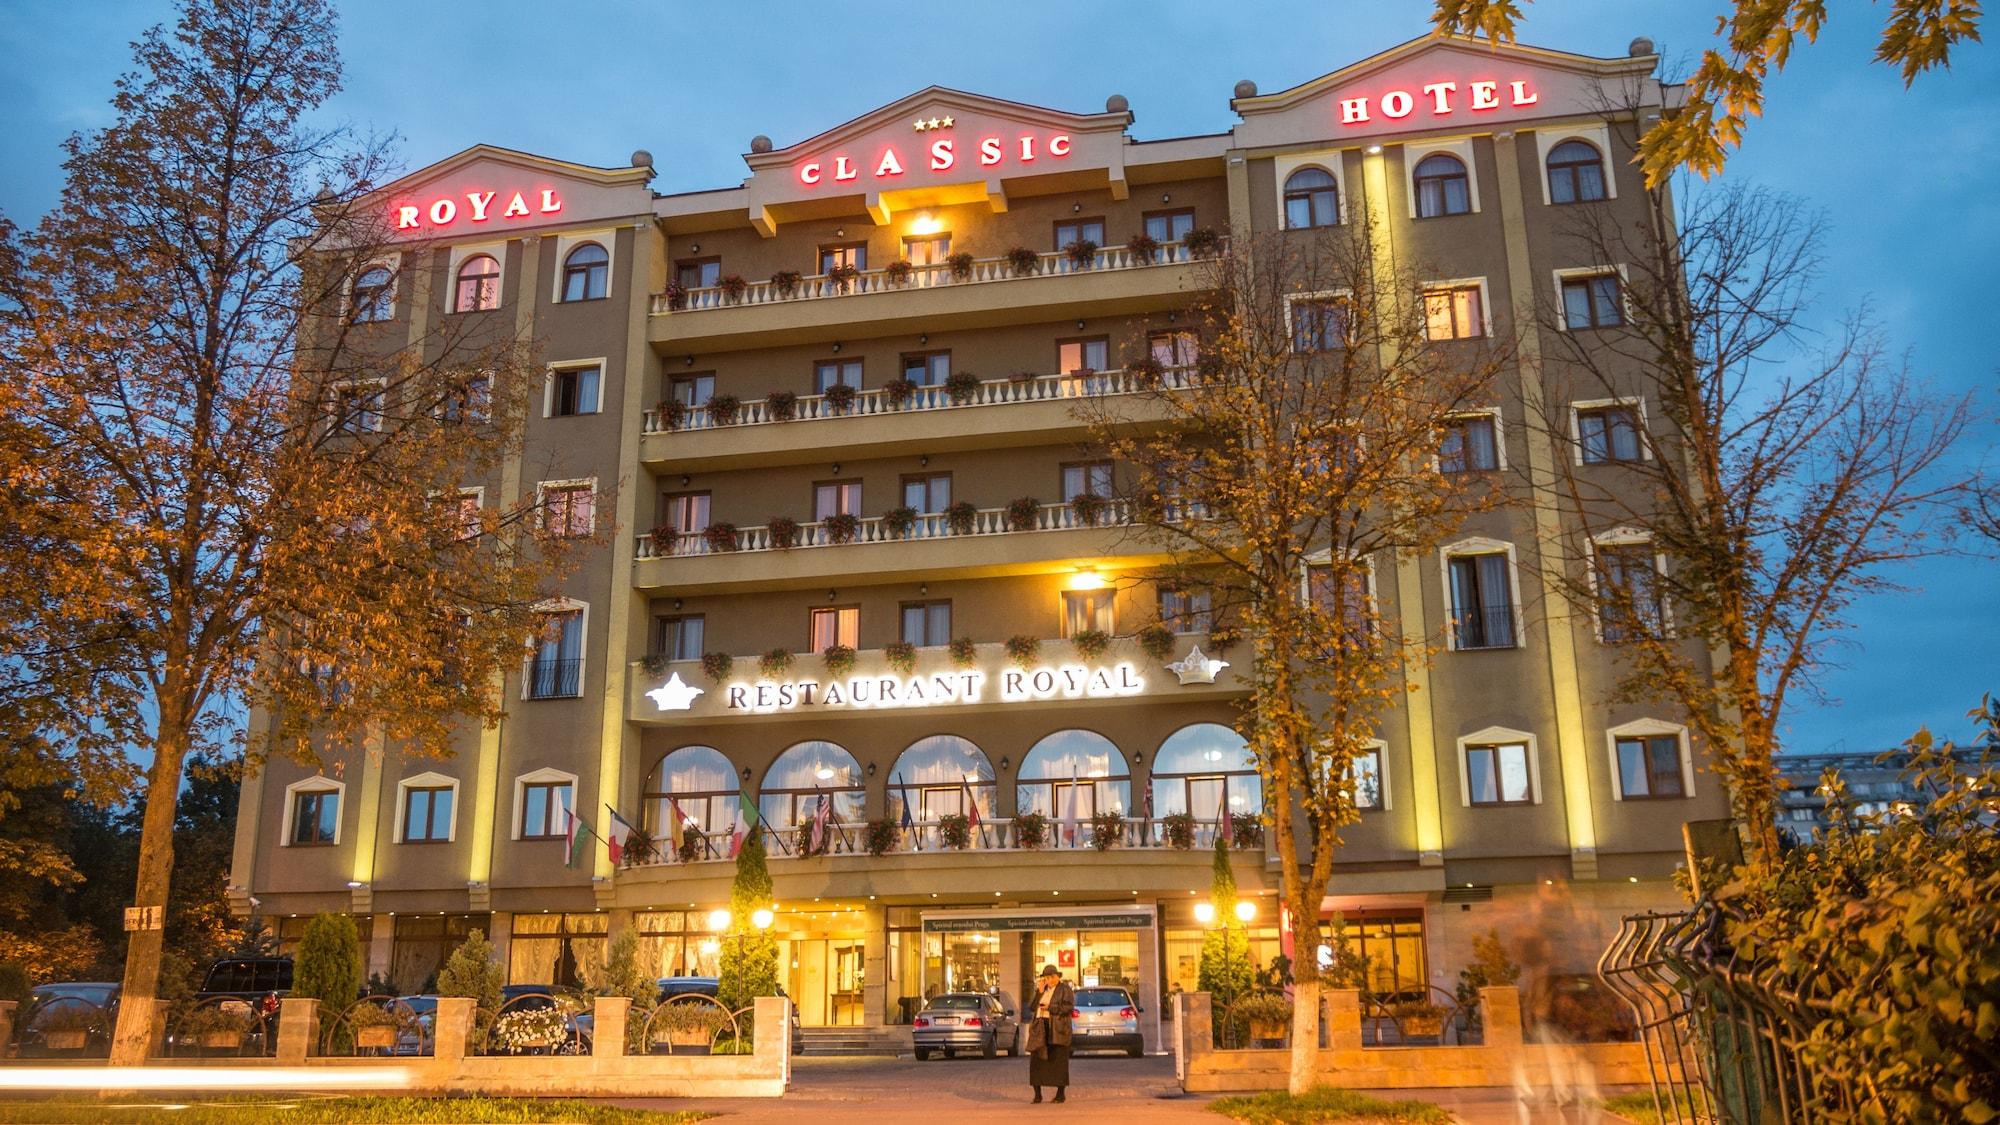 Royal Classic Hotel, Cluj-napoca